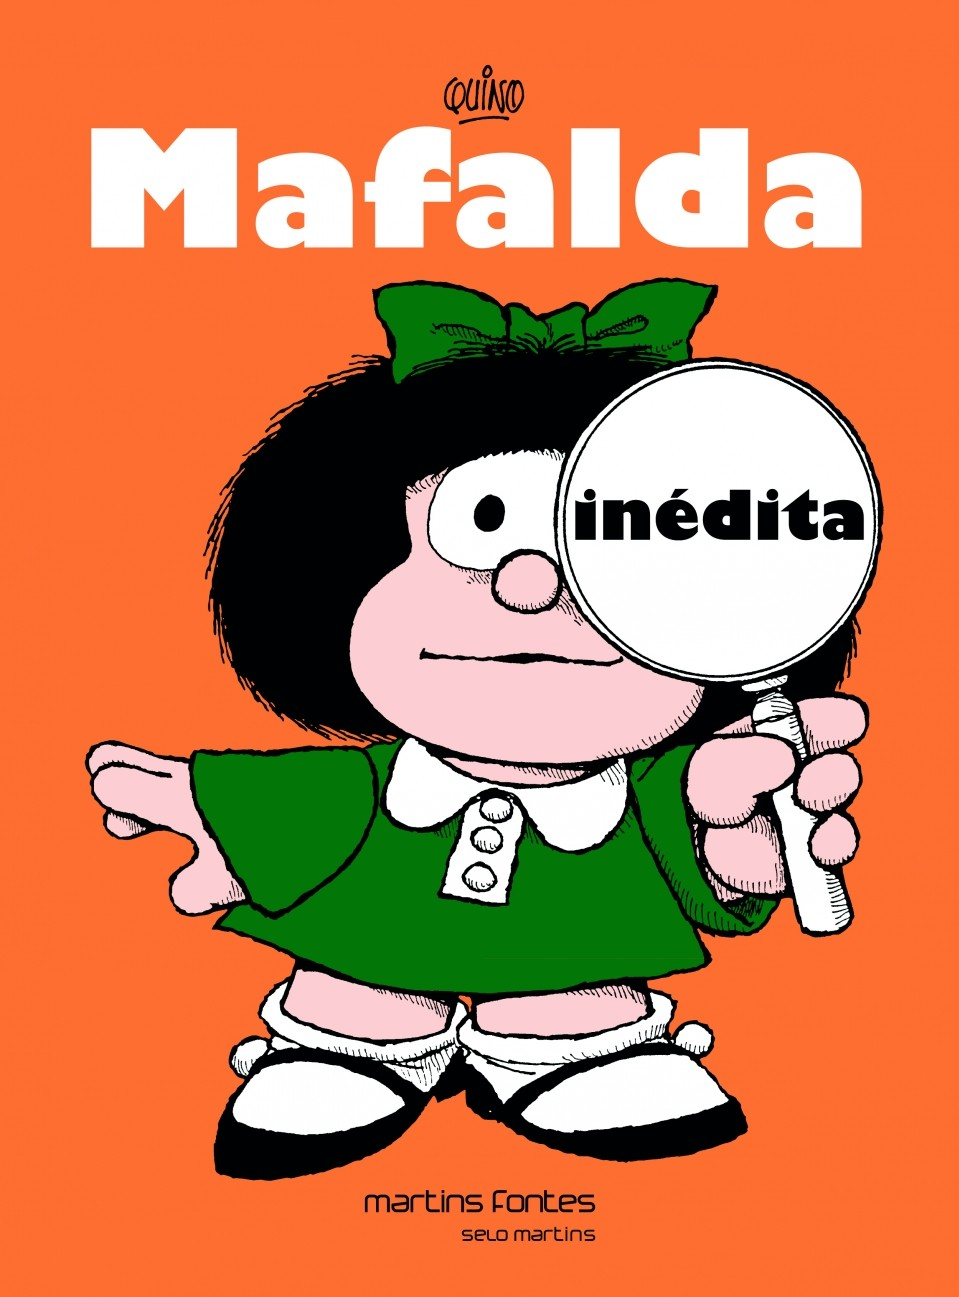 Mafalda - Mafalda Inédita, livro de Joaquín Salvador Lavado (Quino)